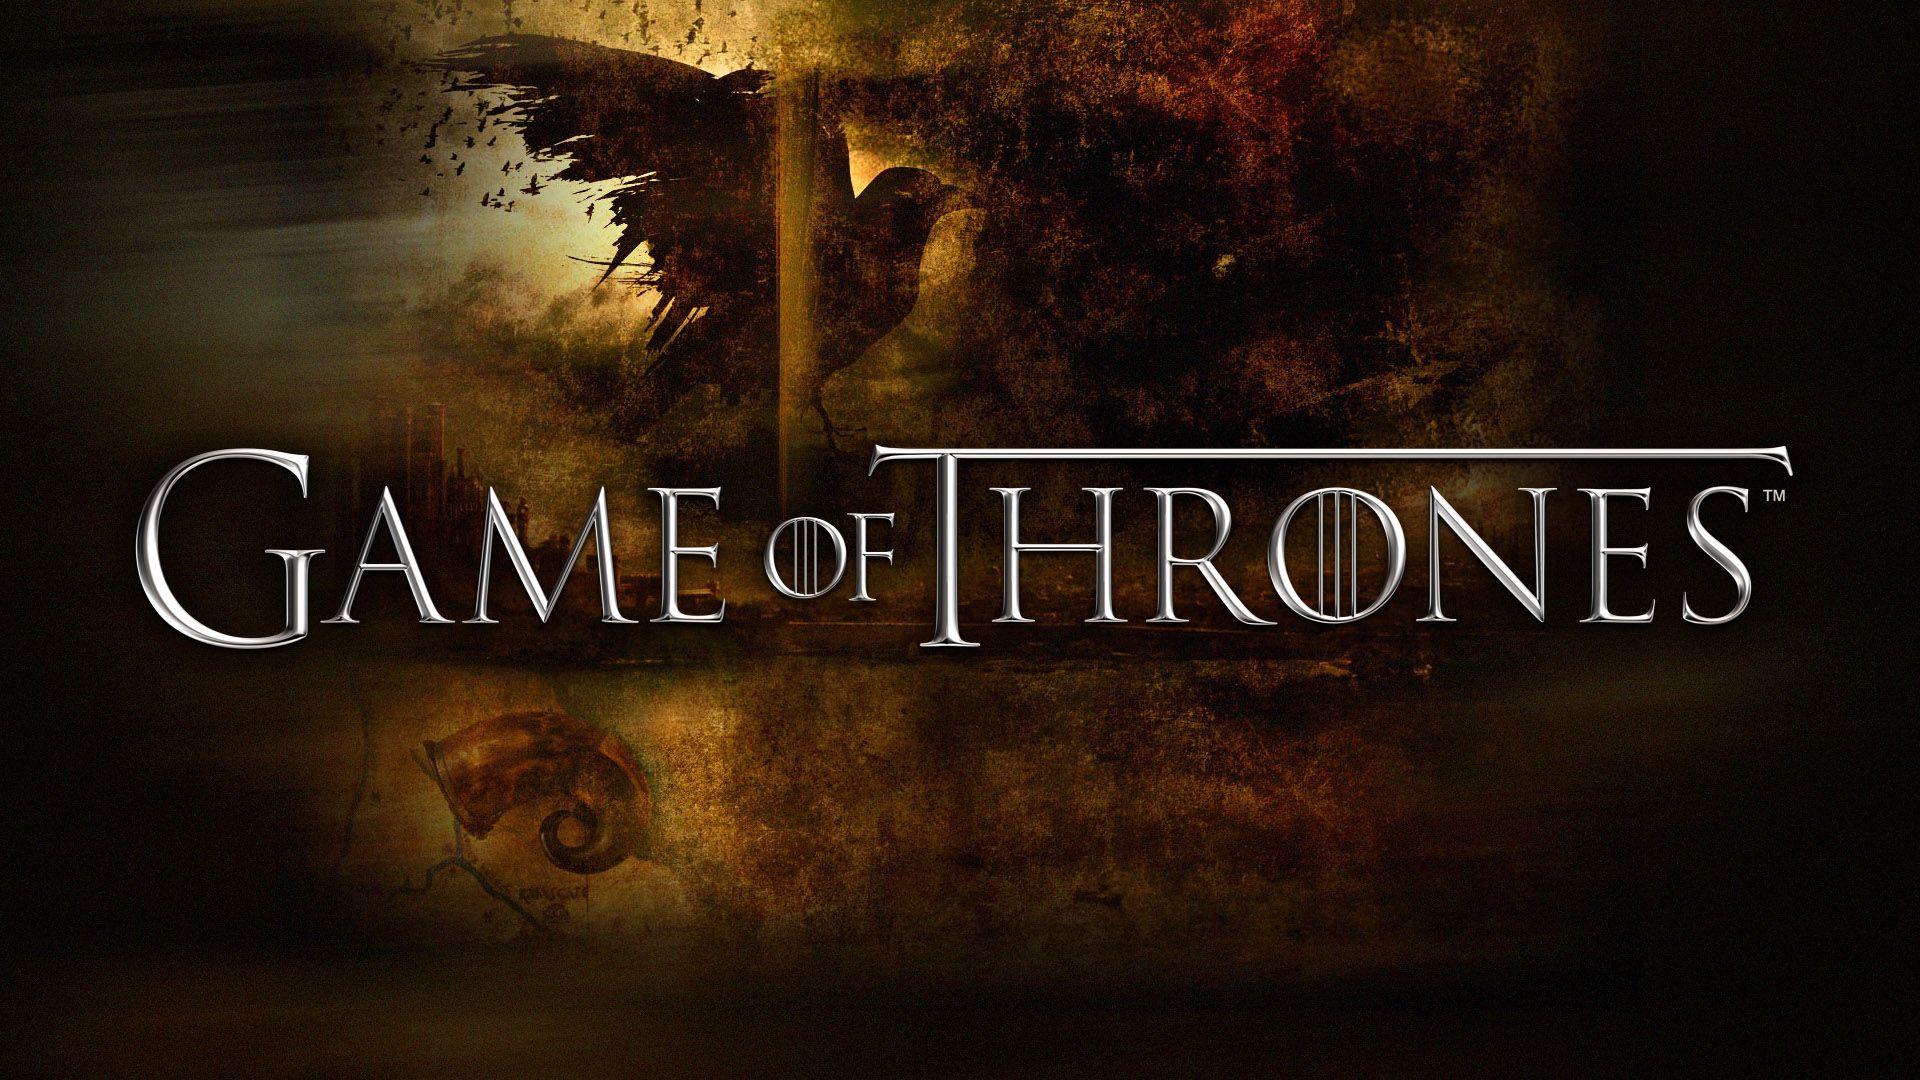 game of thrones season 3 download full episodes